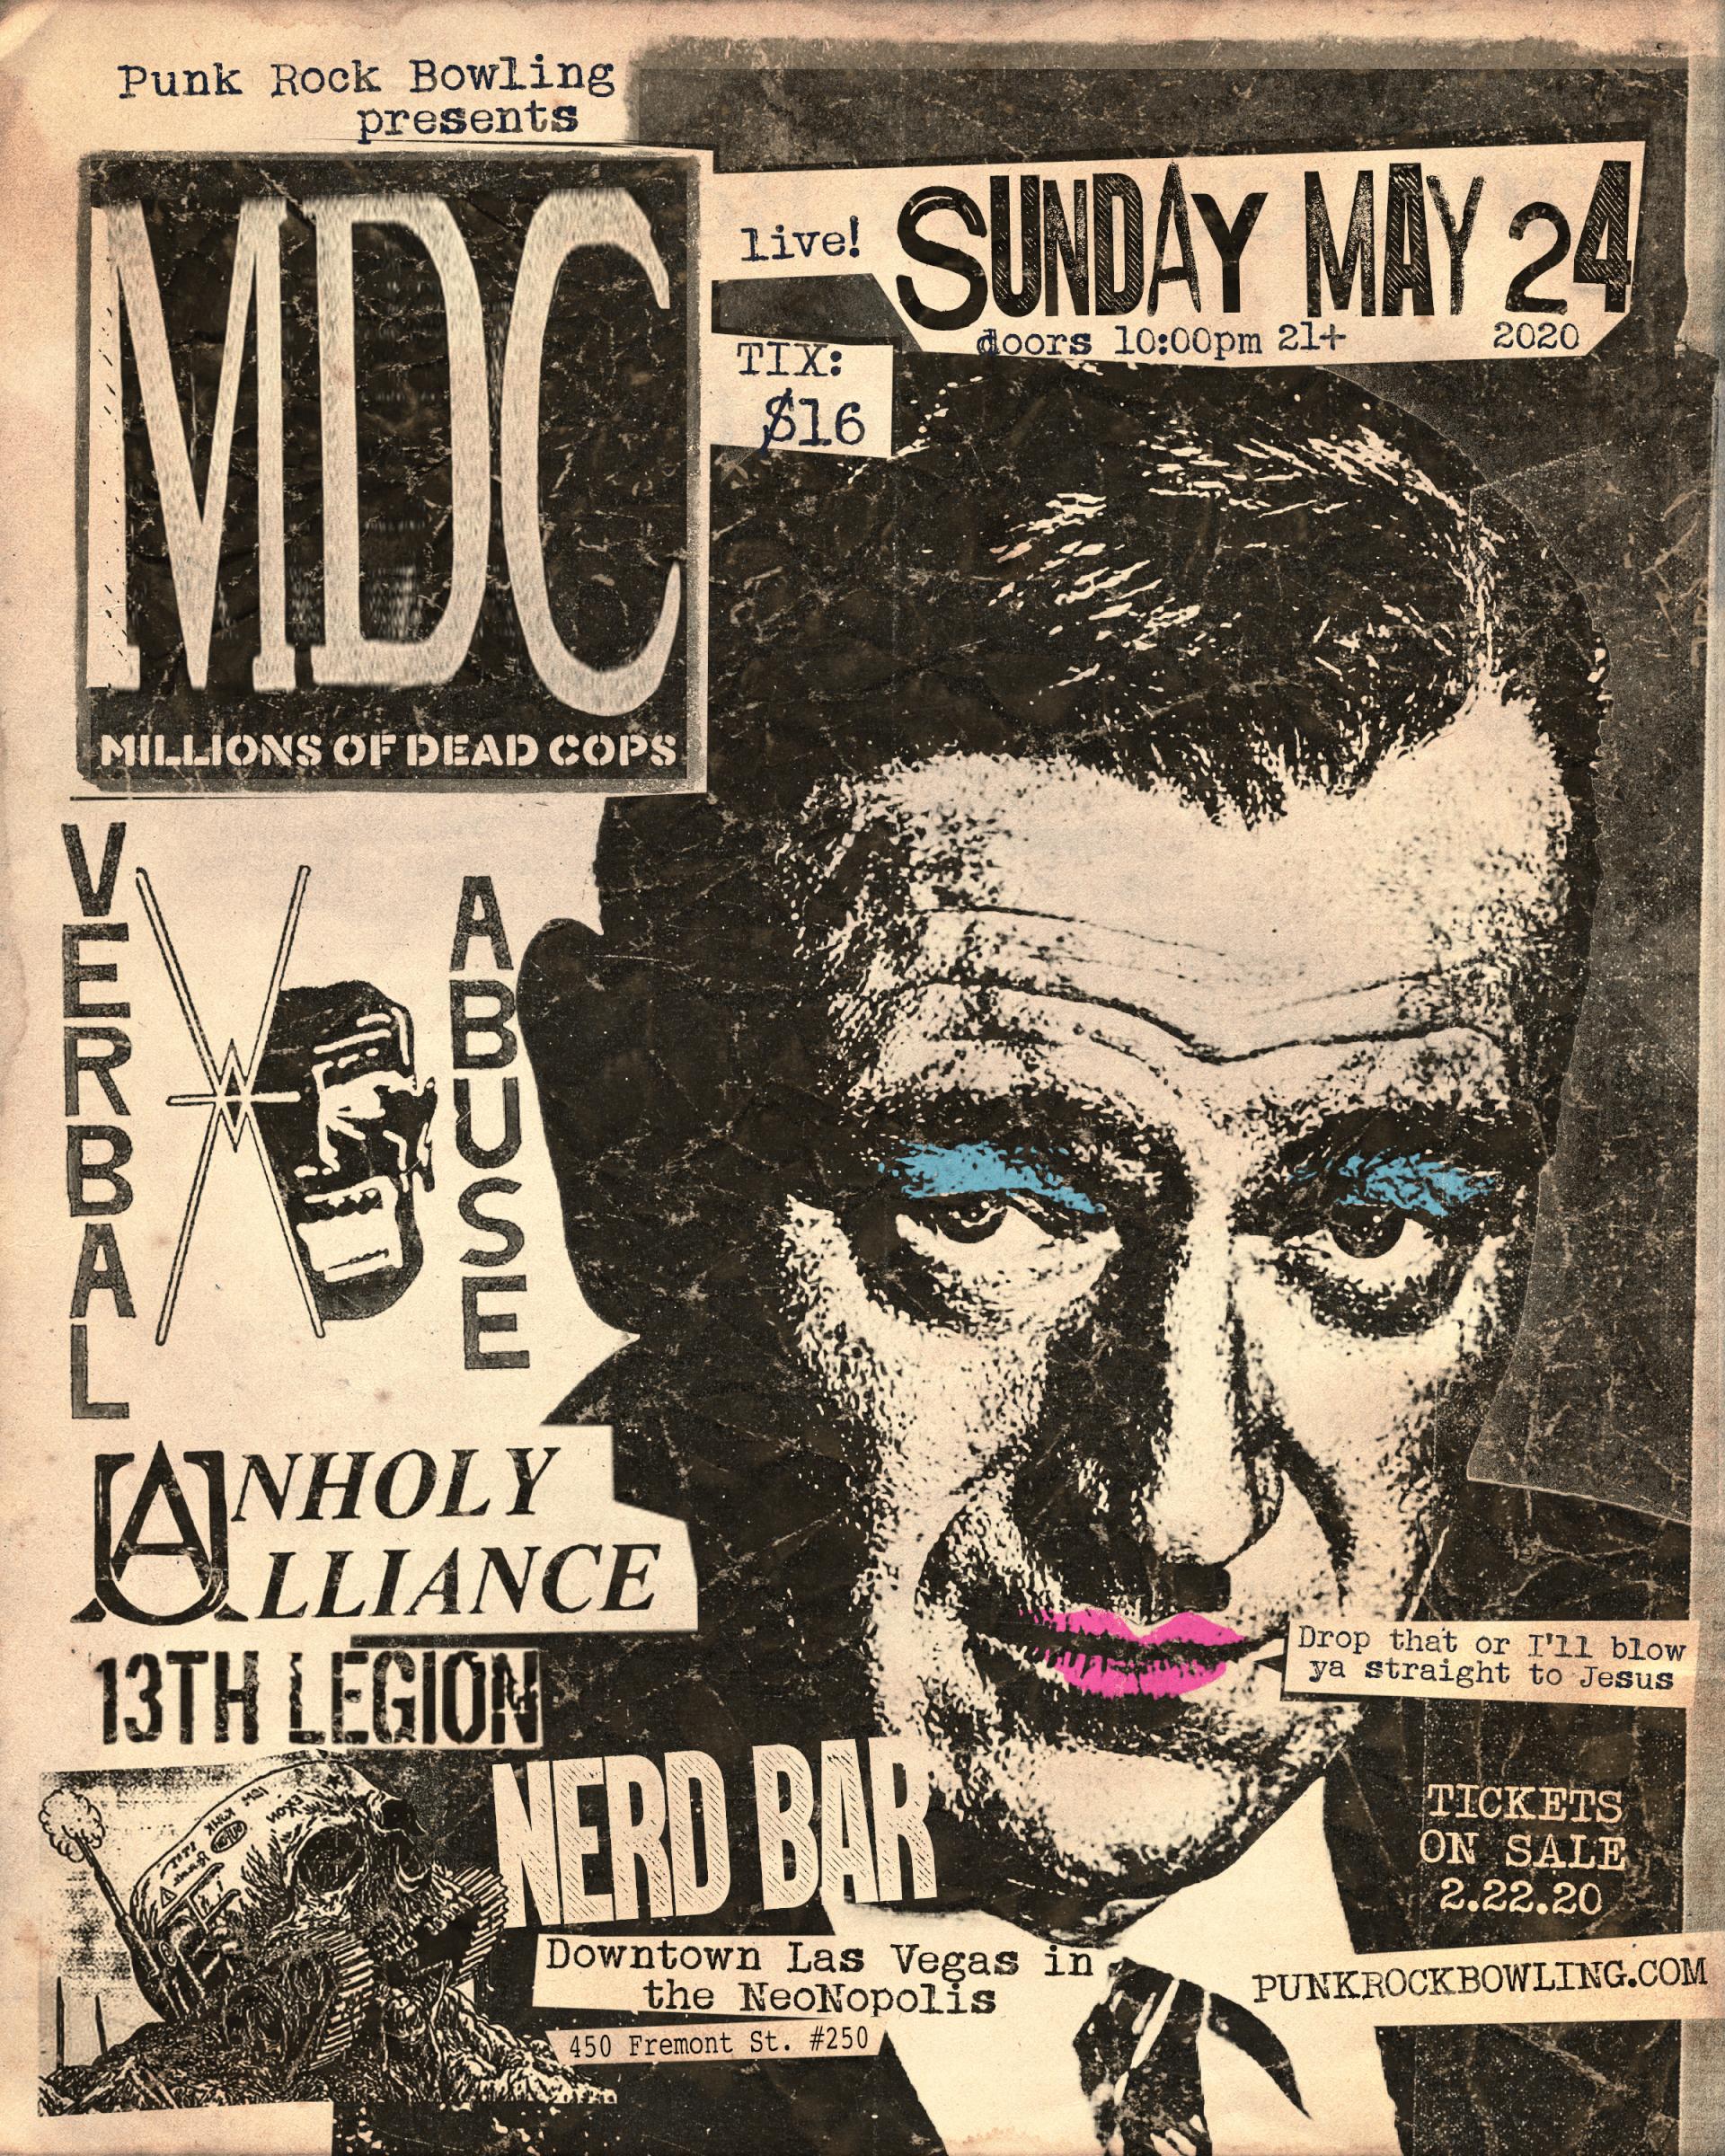 MDC Verbal Abuse Punk Rock Bowling 2020 Las Vegas